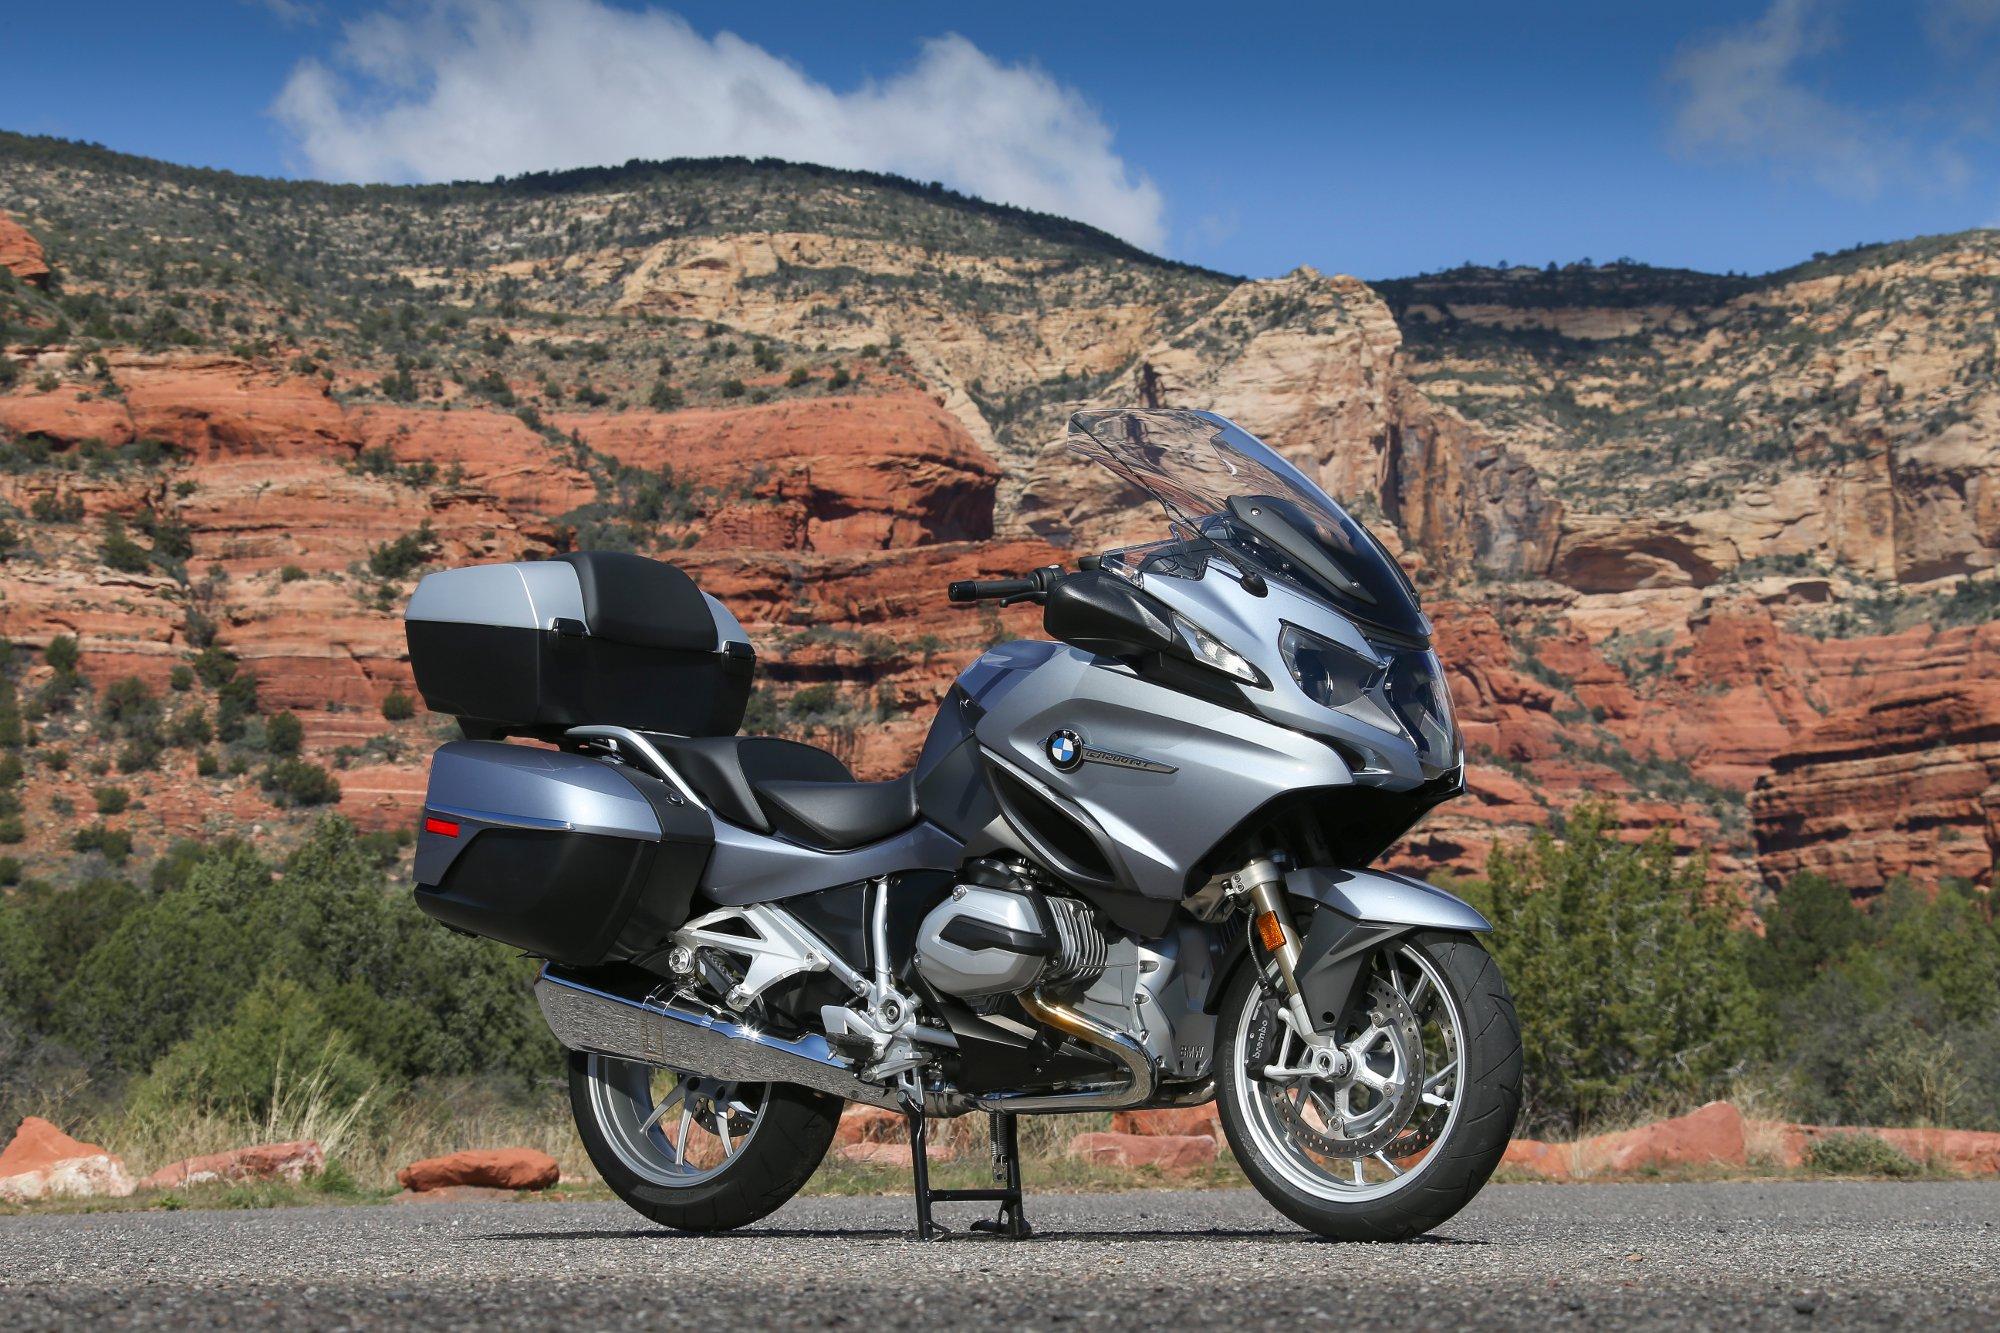 rappel bmw r1200 rt canada moto guide. Black Bedroom Furniture Sets. Home Design Ideas